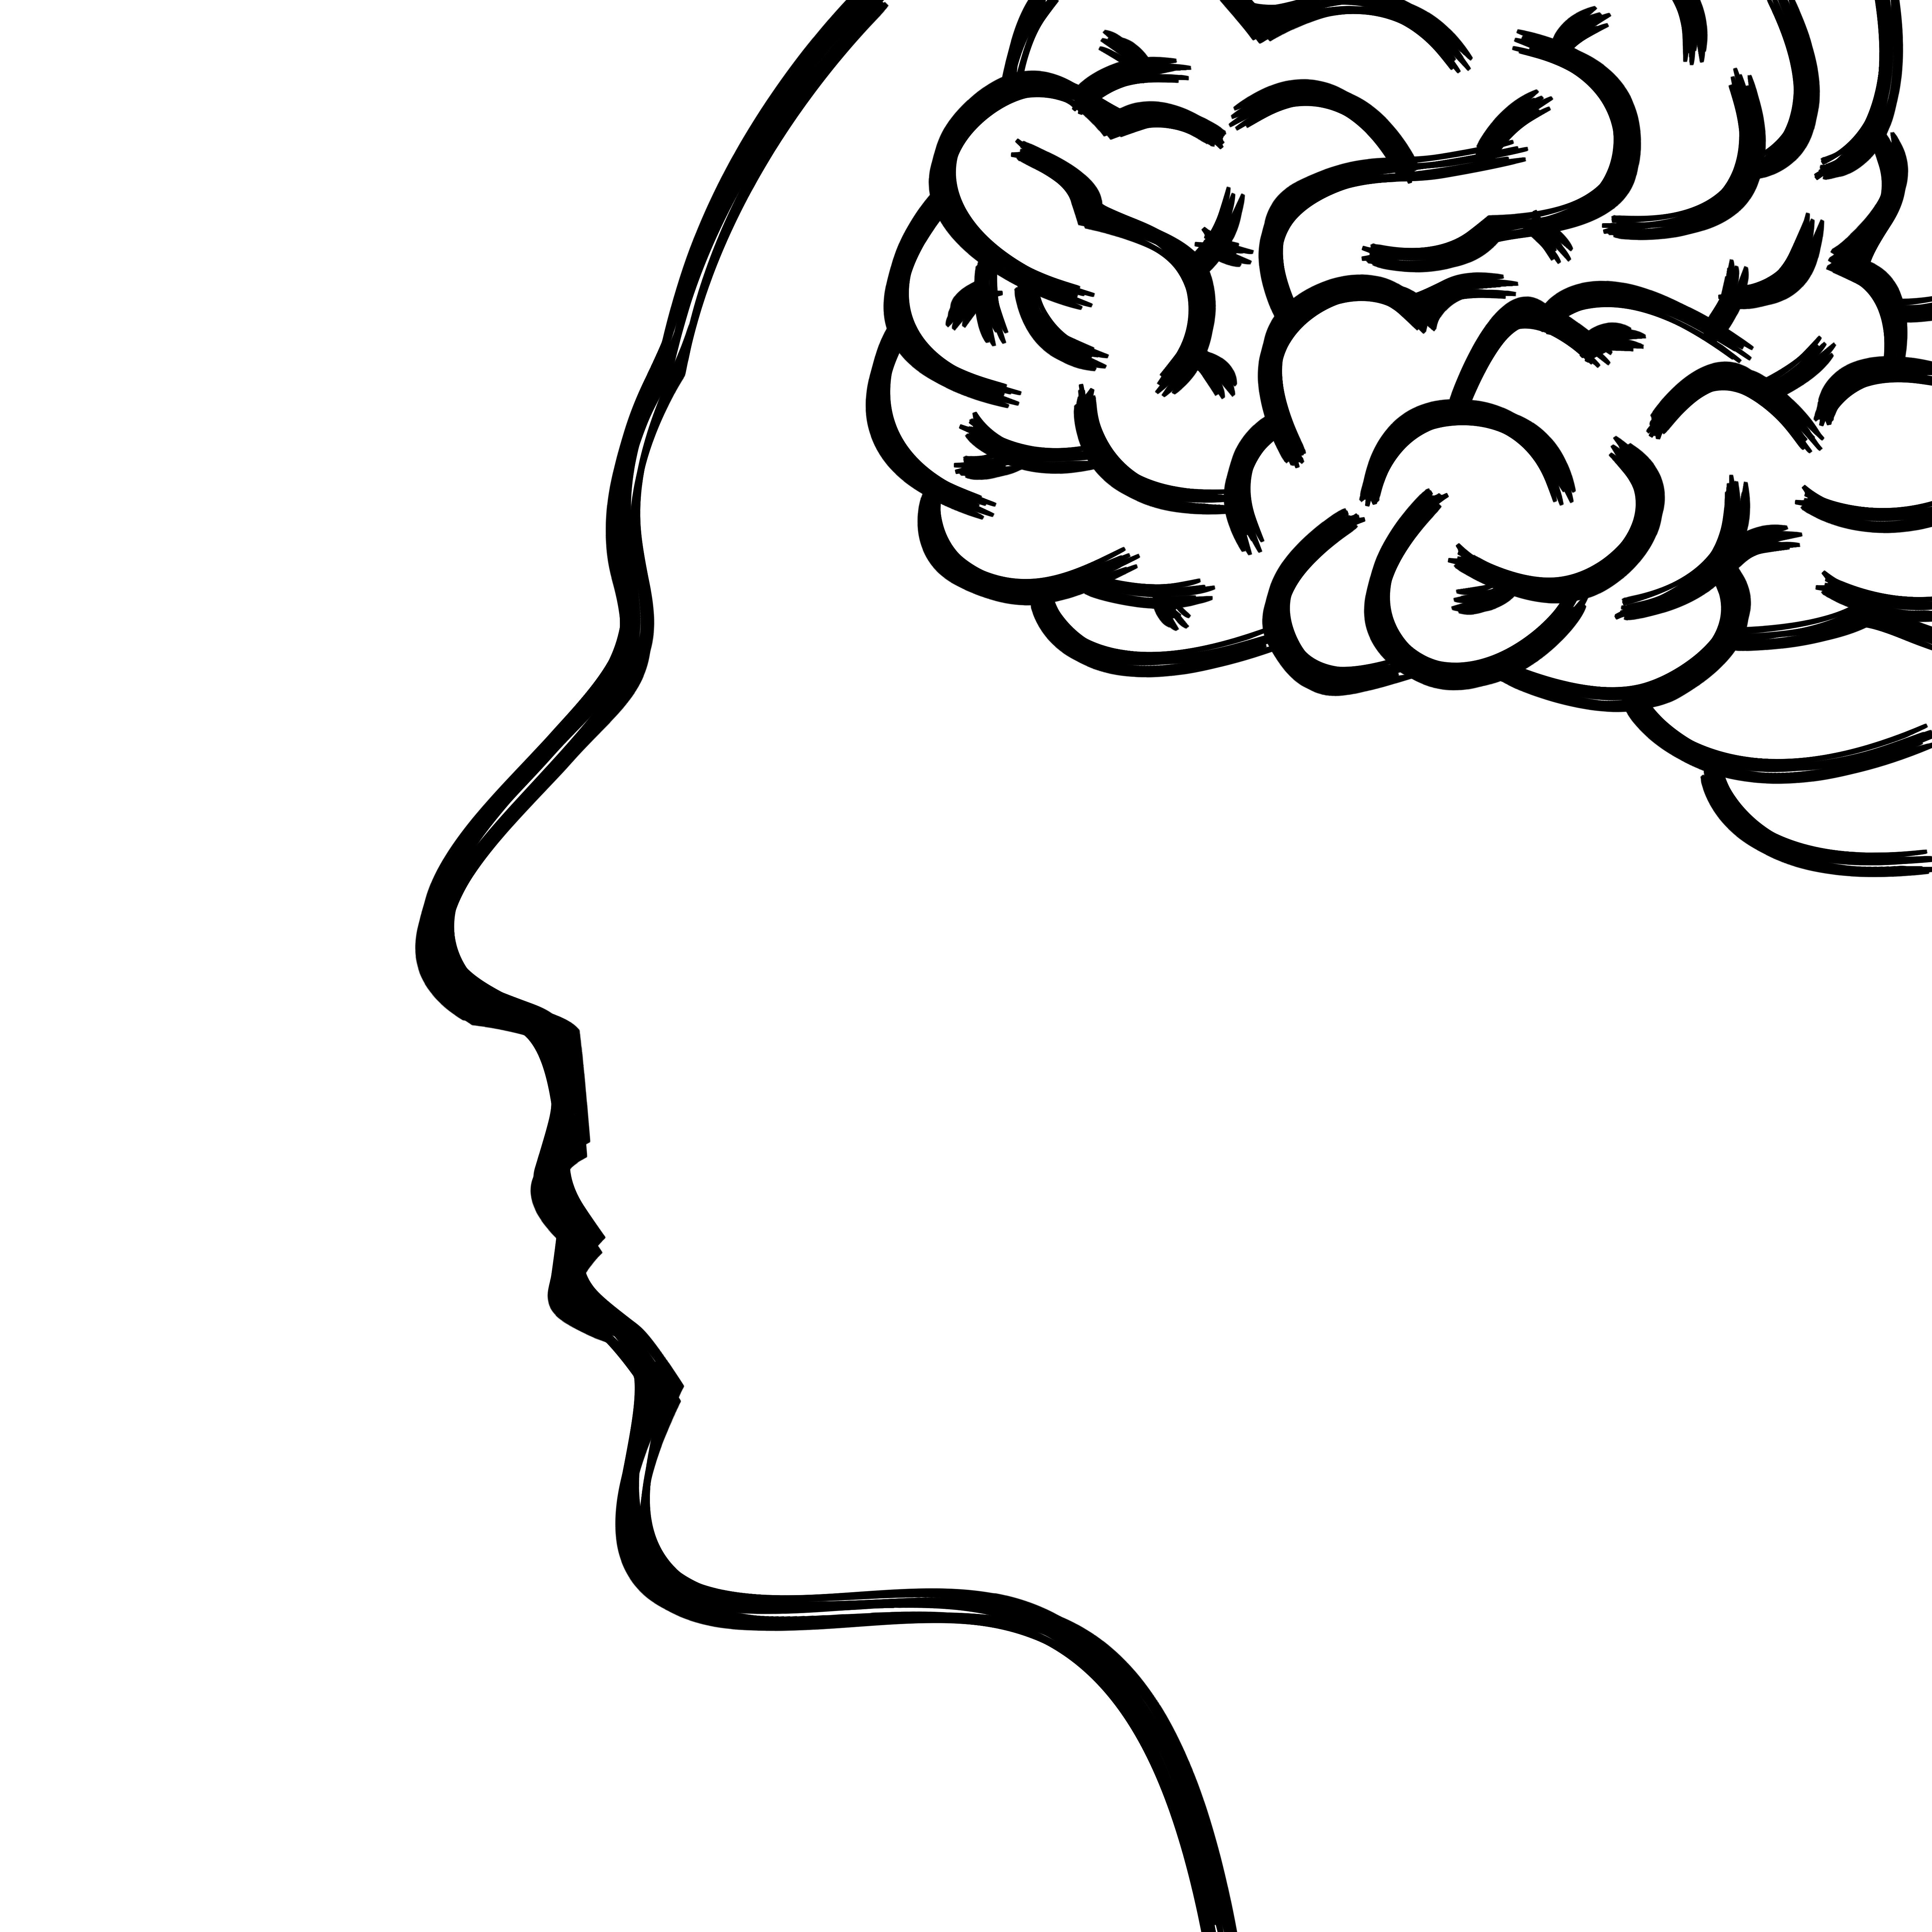 Drawn brain human body #7